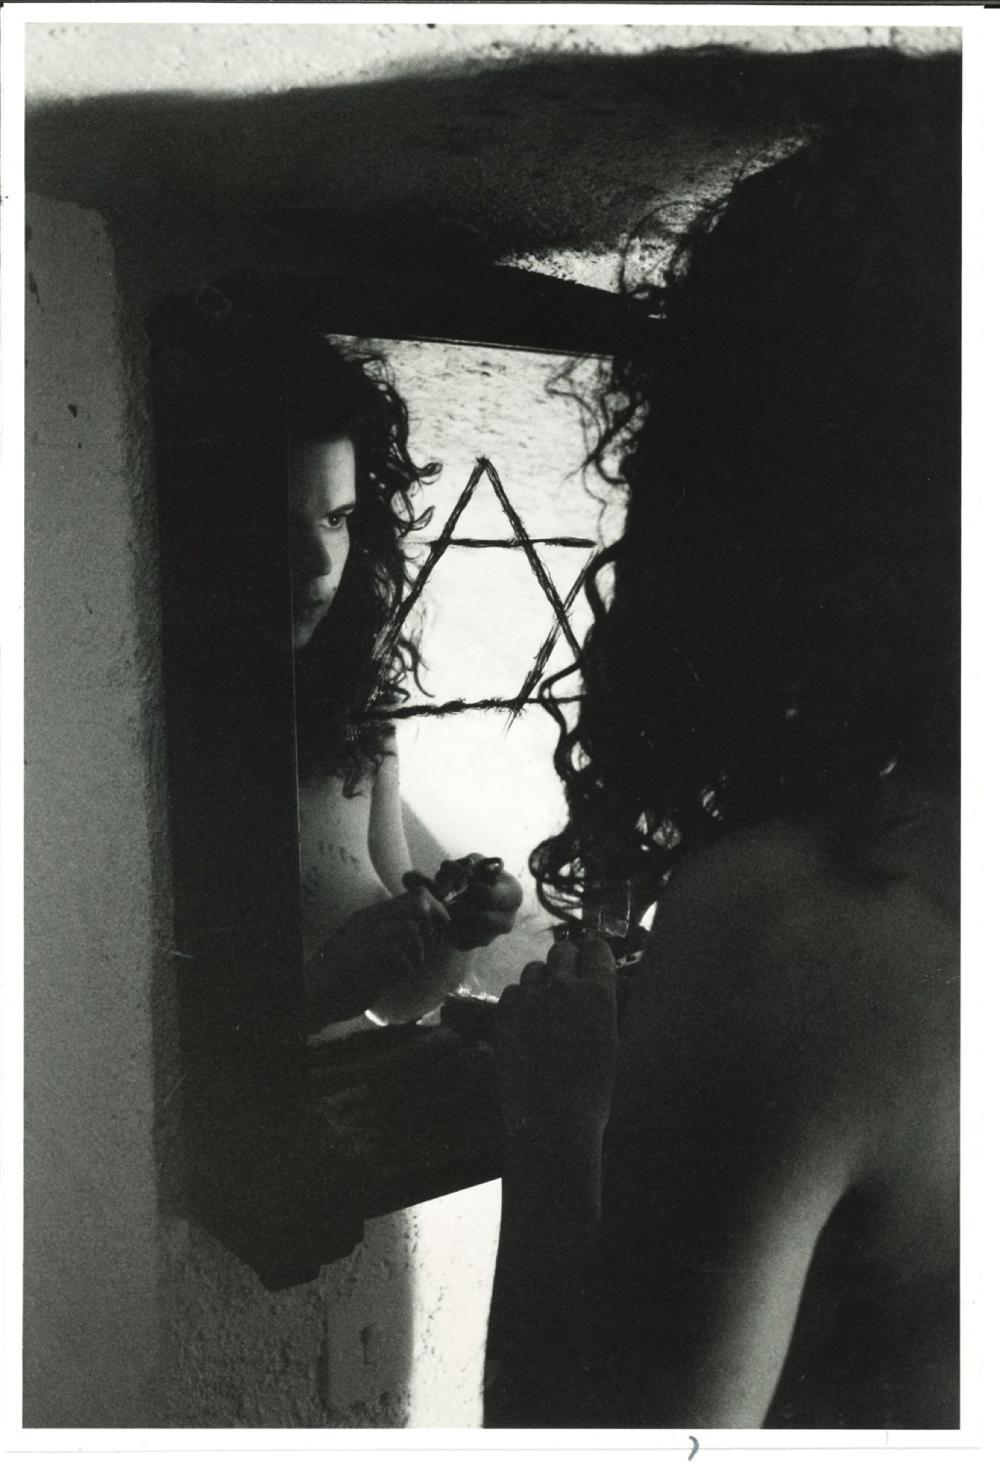 Claudio Abate (1943-2017) - Ebrea, Fabio Mauri, 1971